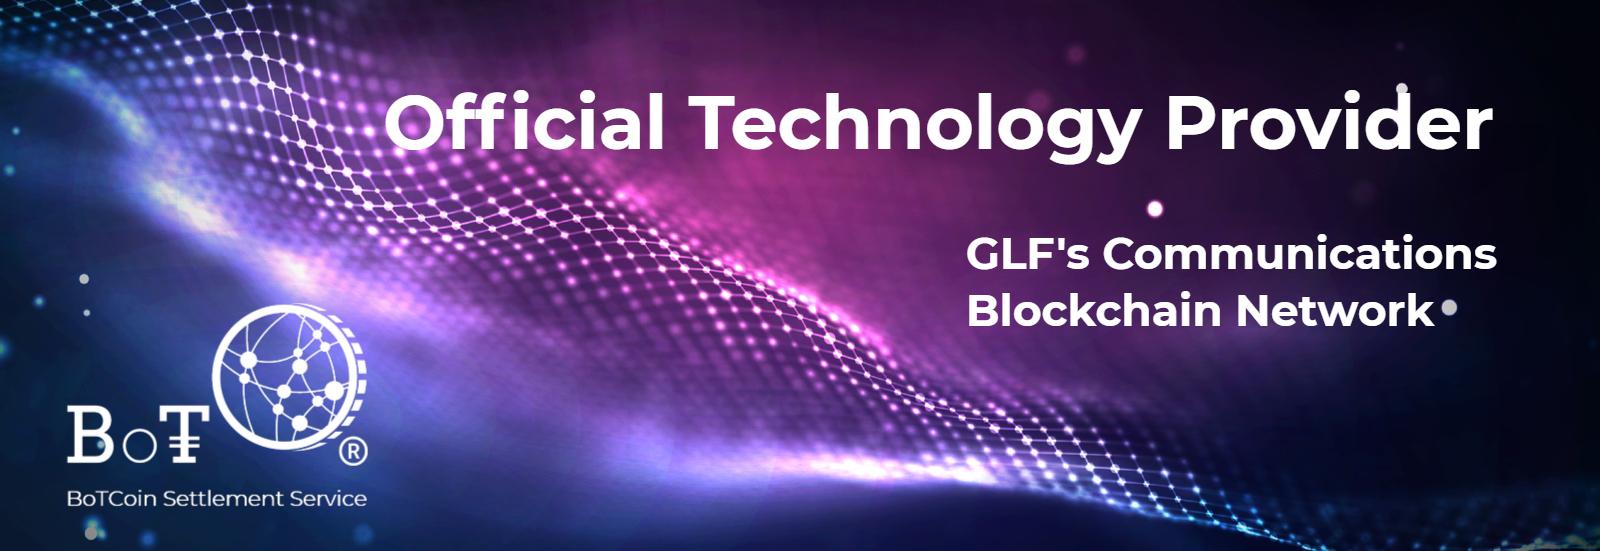 BoTCoin GLF Communications Blockchain Network